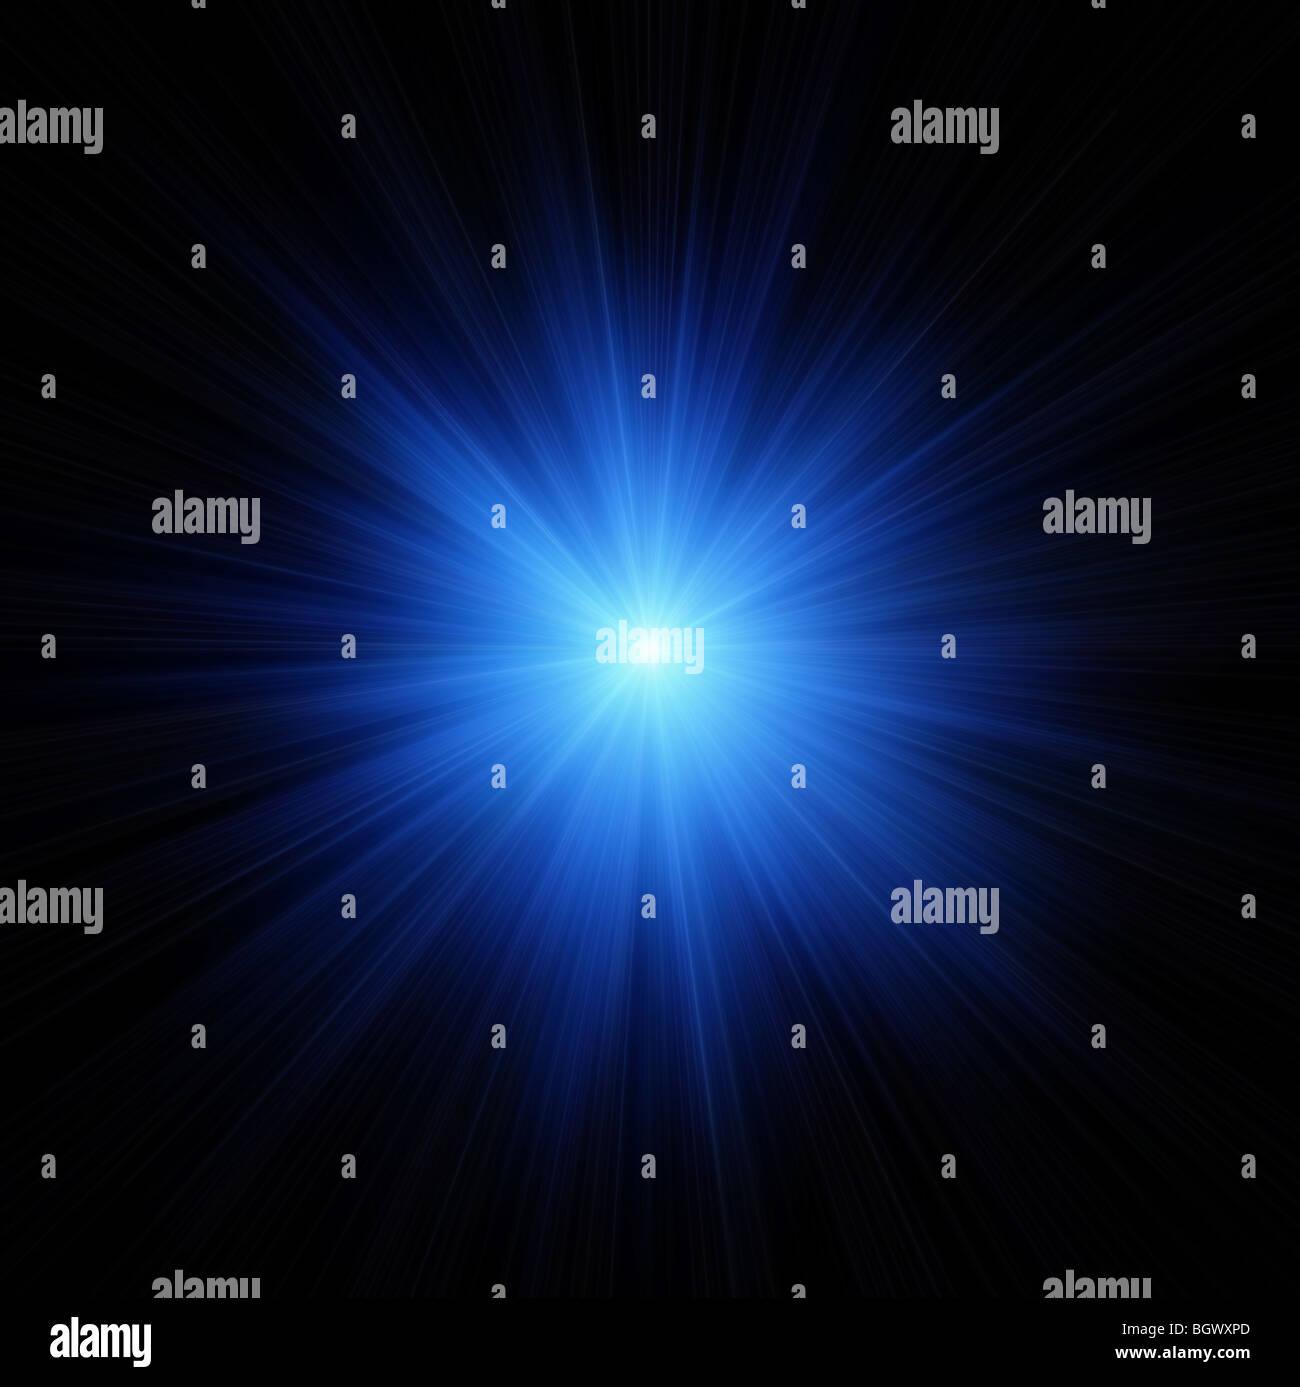 Blue Star Flash On Black Background Stock Photo Alamy